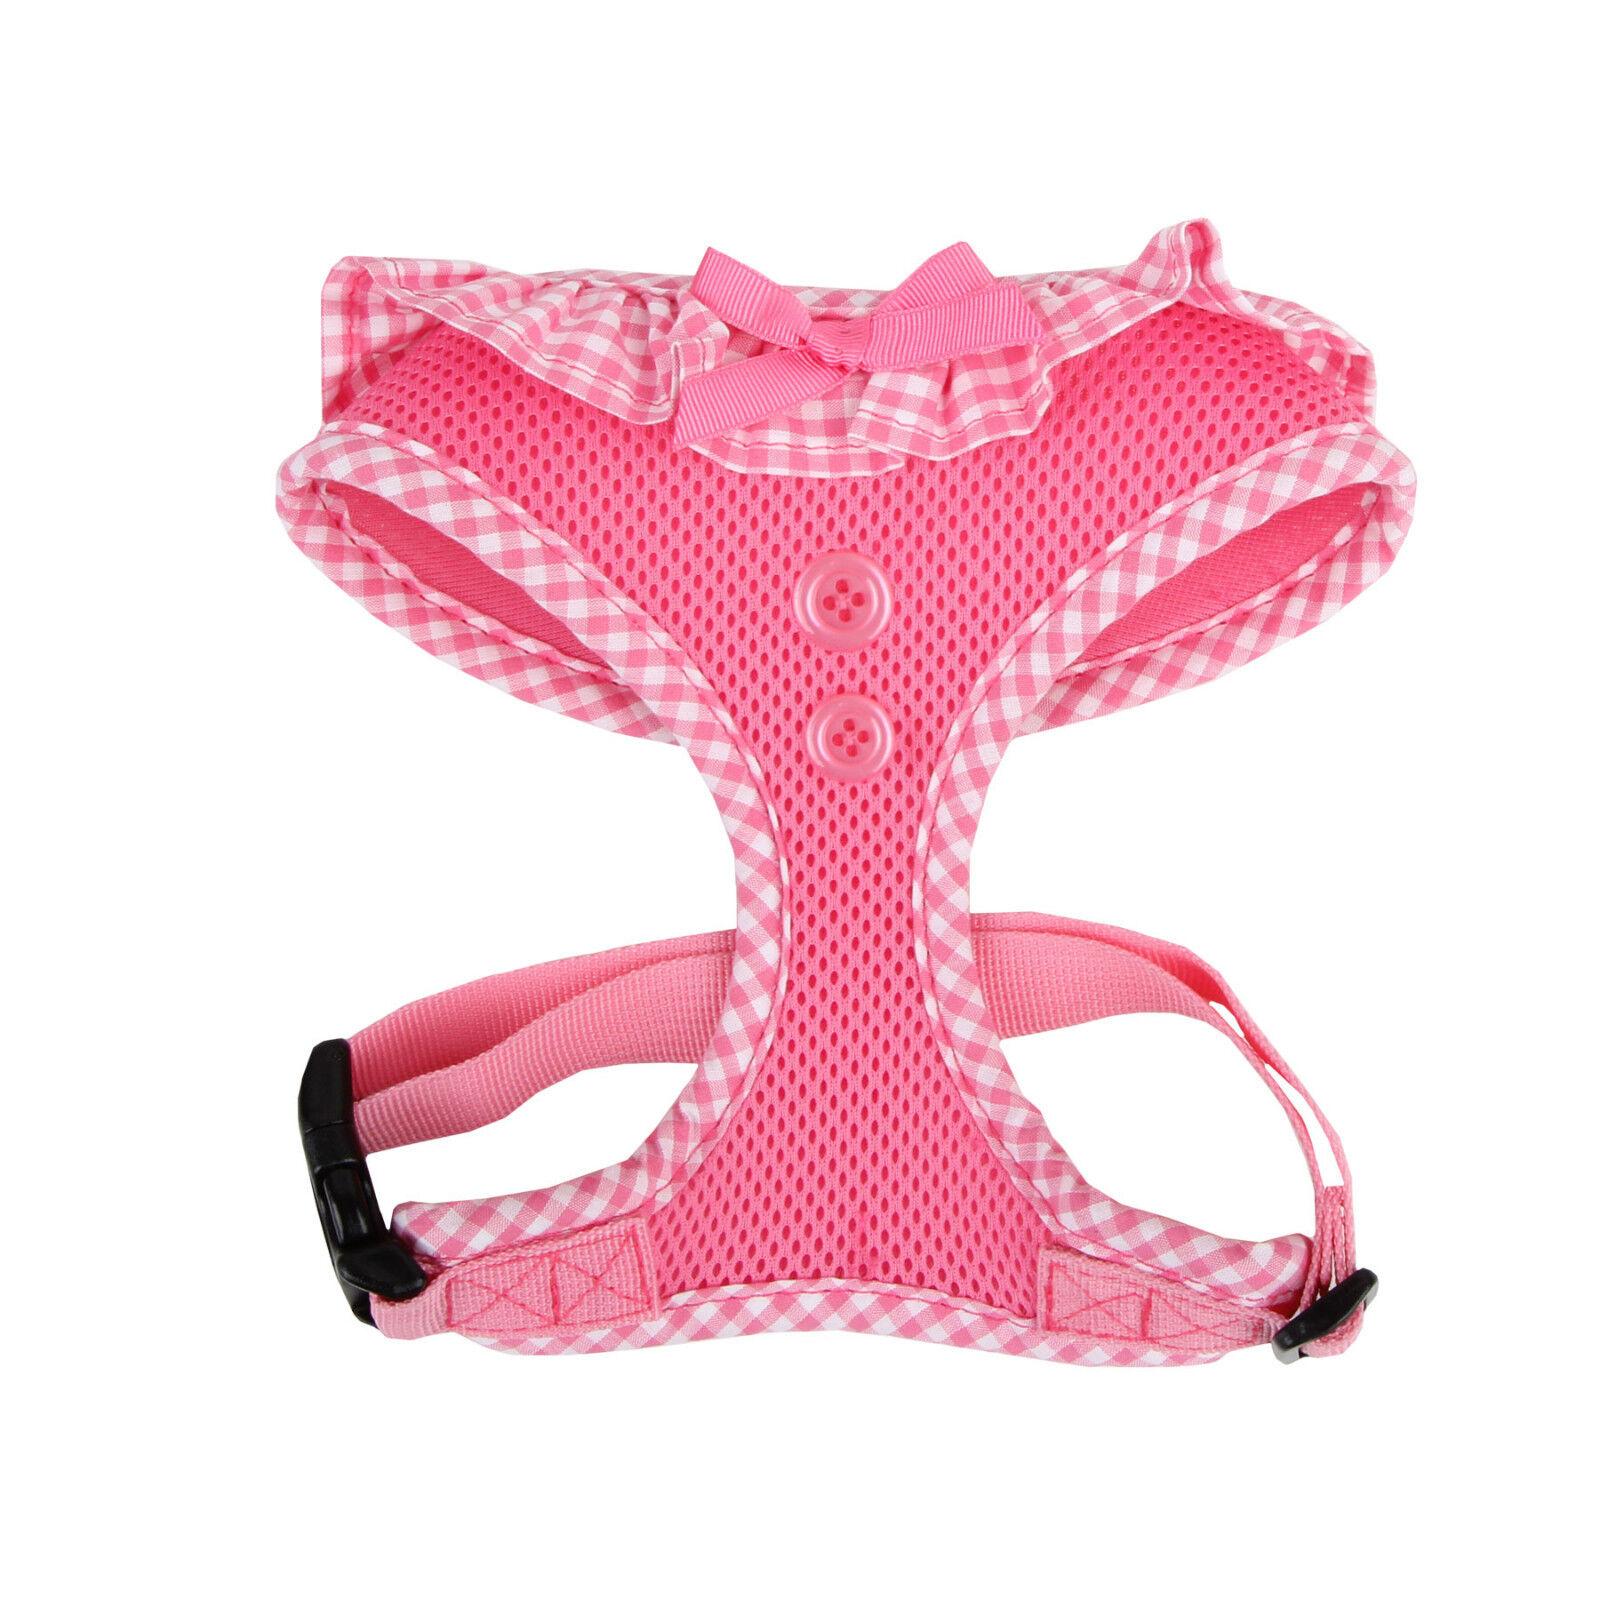 Puppia - Dog Puppy Mesh Harness - Vivien - Pink - XS, S, M,